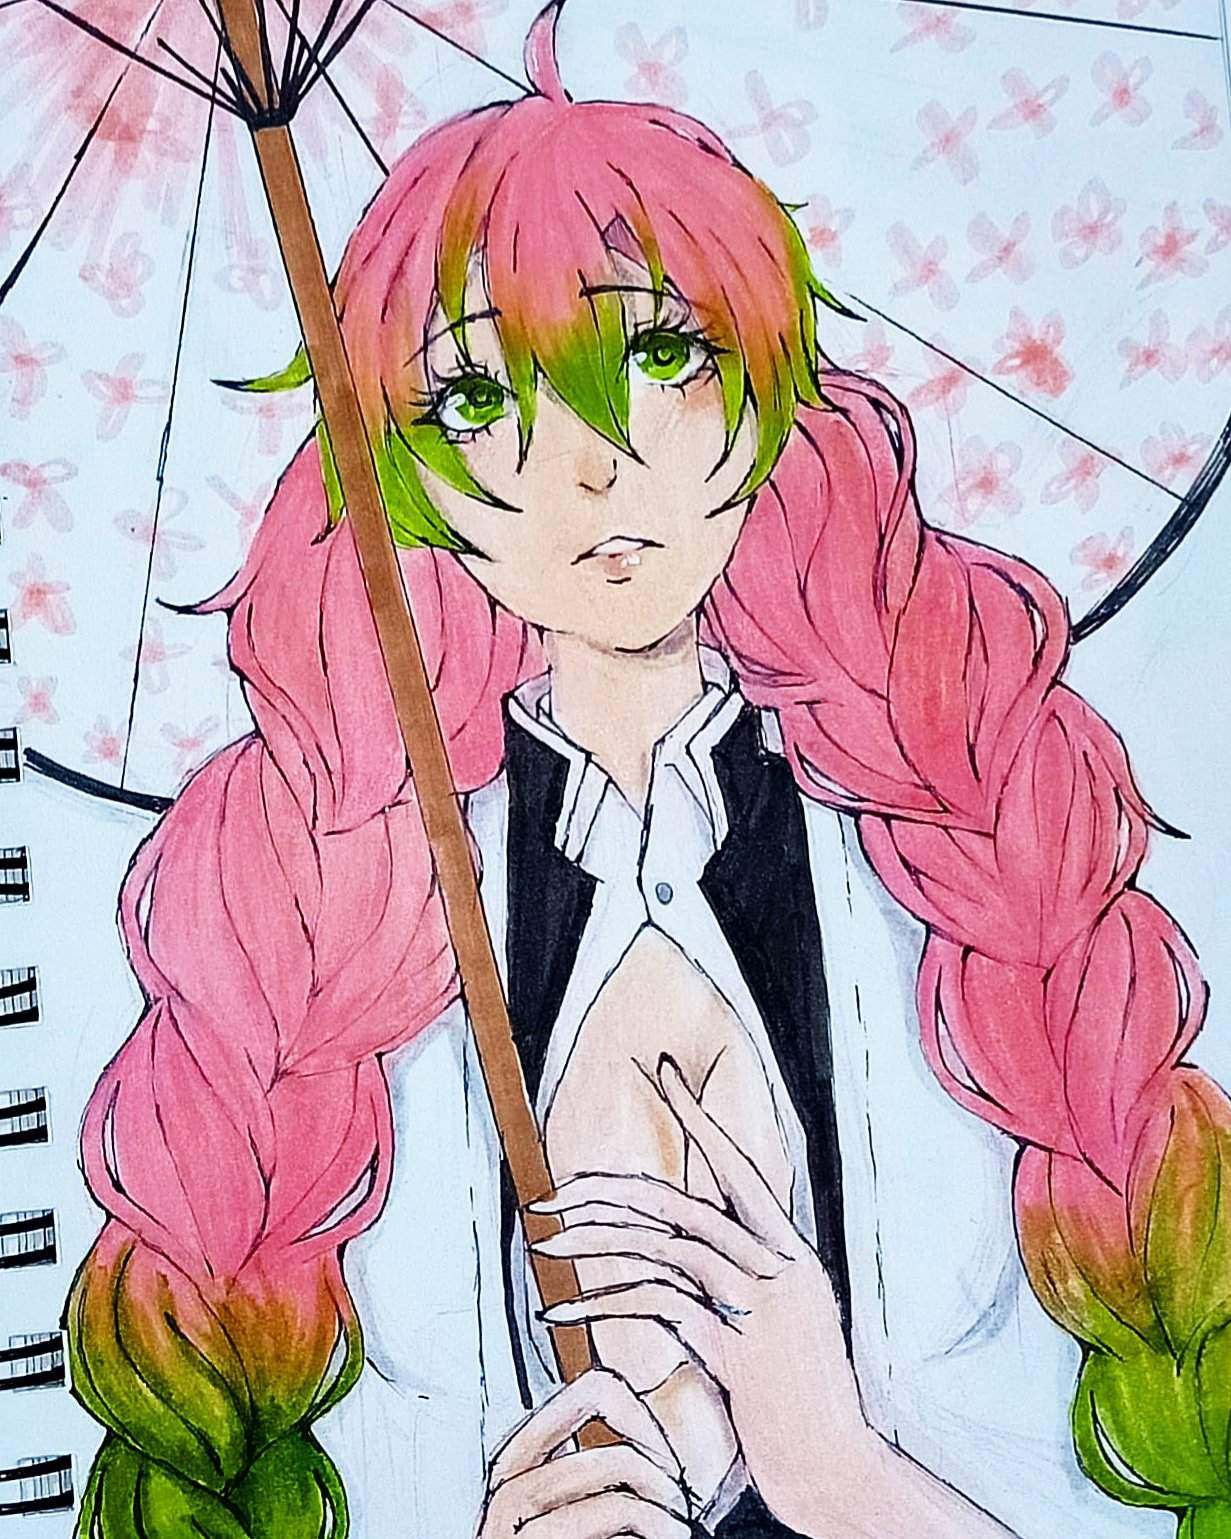 Fan Art Of Mitsuri Kanroji I Hope You Like It Demon Slayer Kimetsu No Yaiba Amino A character in kimetsu no yaiba. amino apps